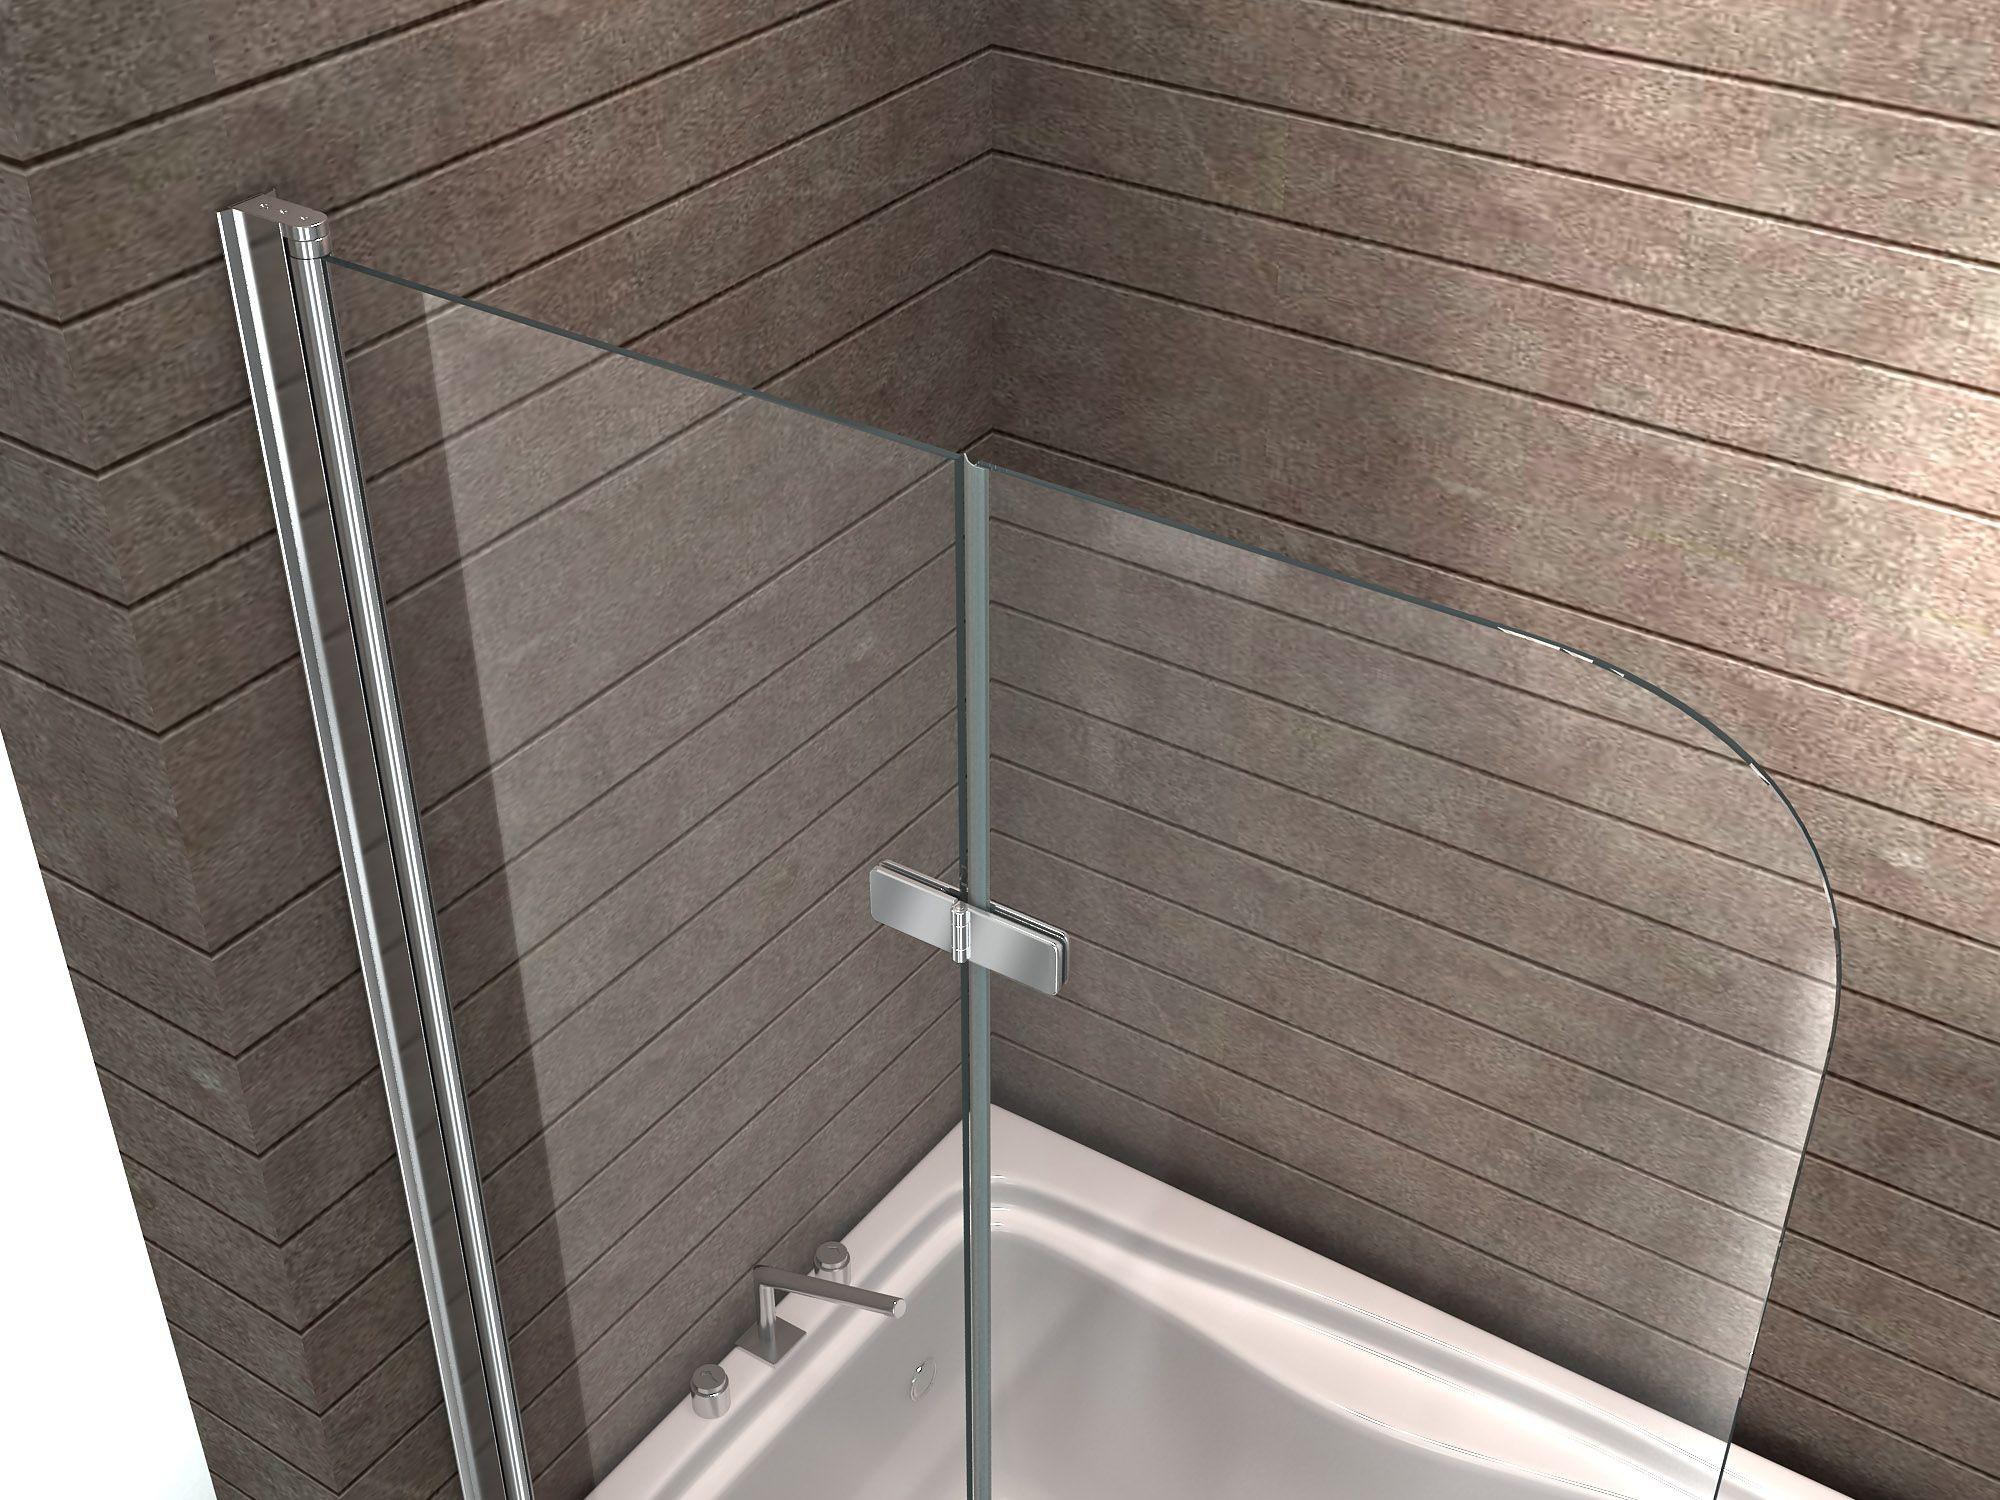 Duschtrennwand brease 120 x 140 badewanne glasdeals - Douche sur mesure castorama ...